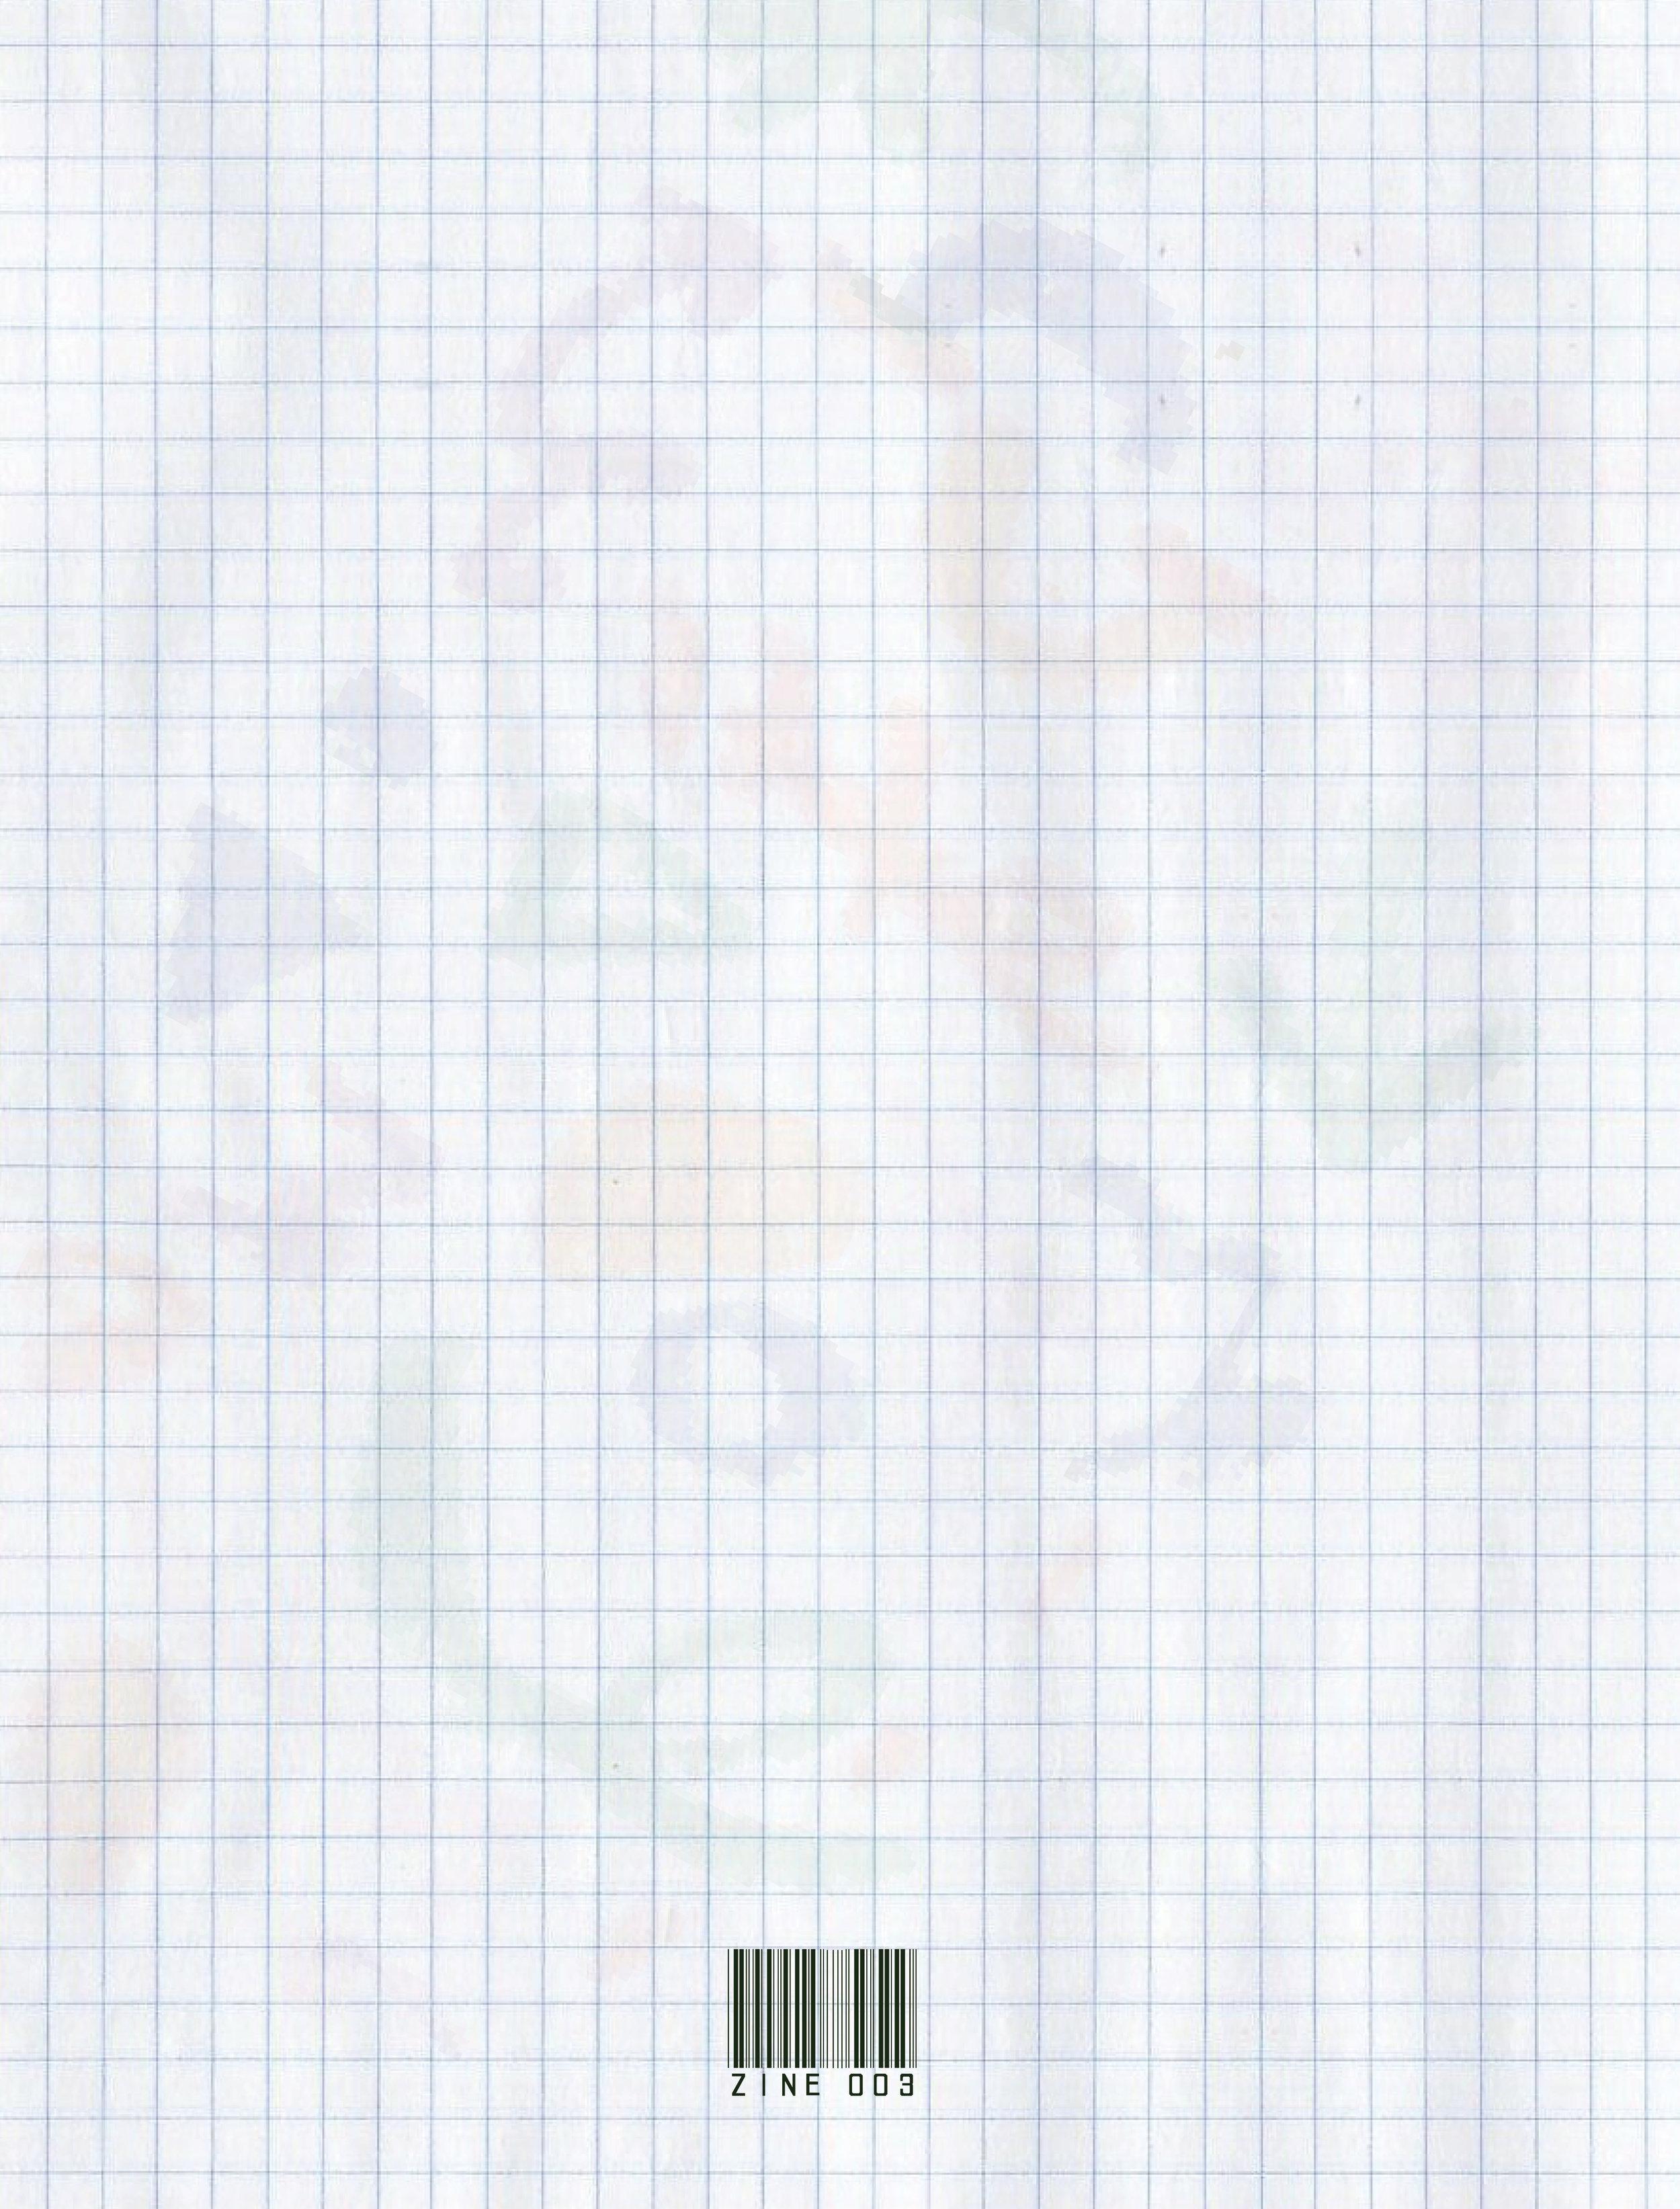 zine03-R3FULL24.jpg